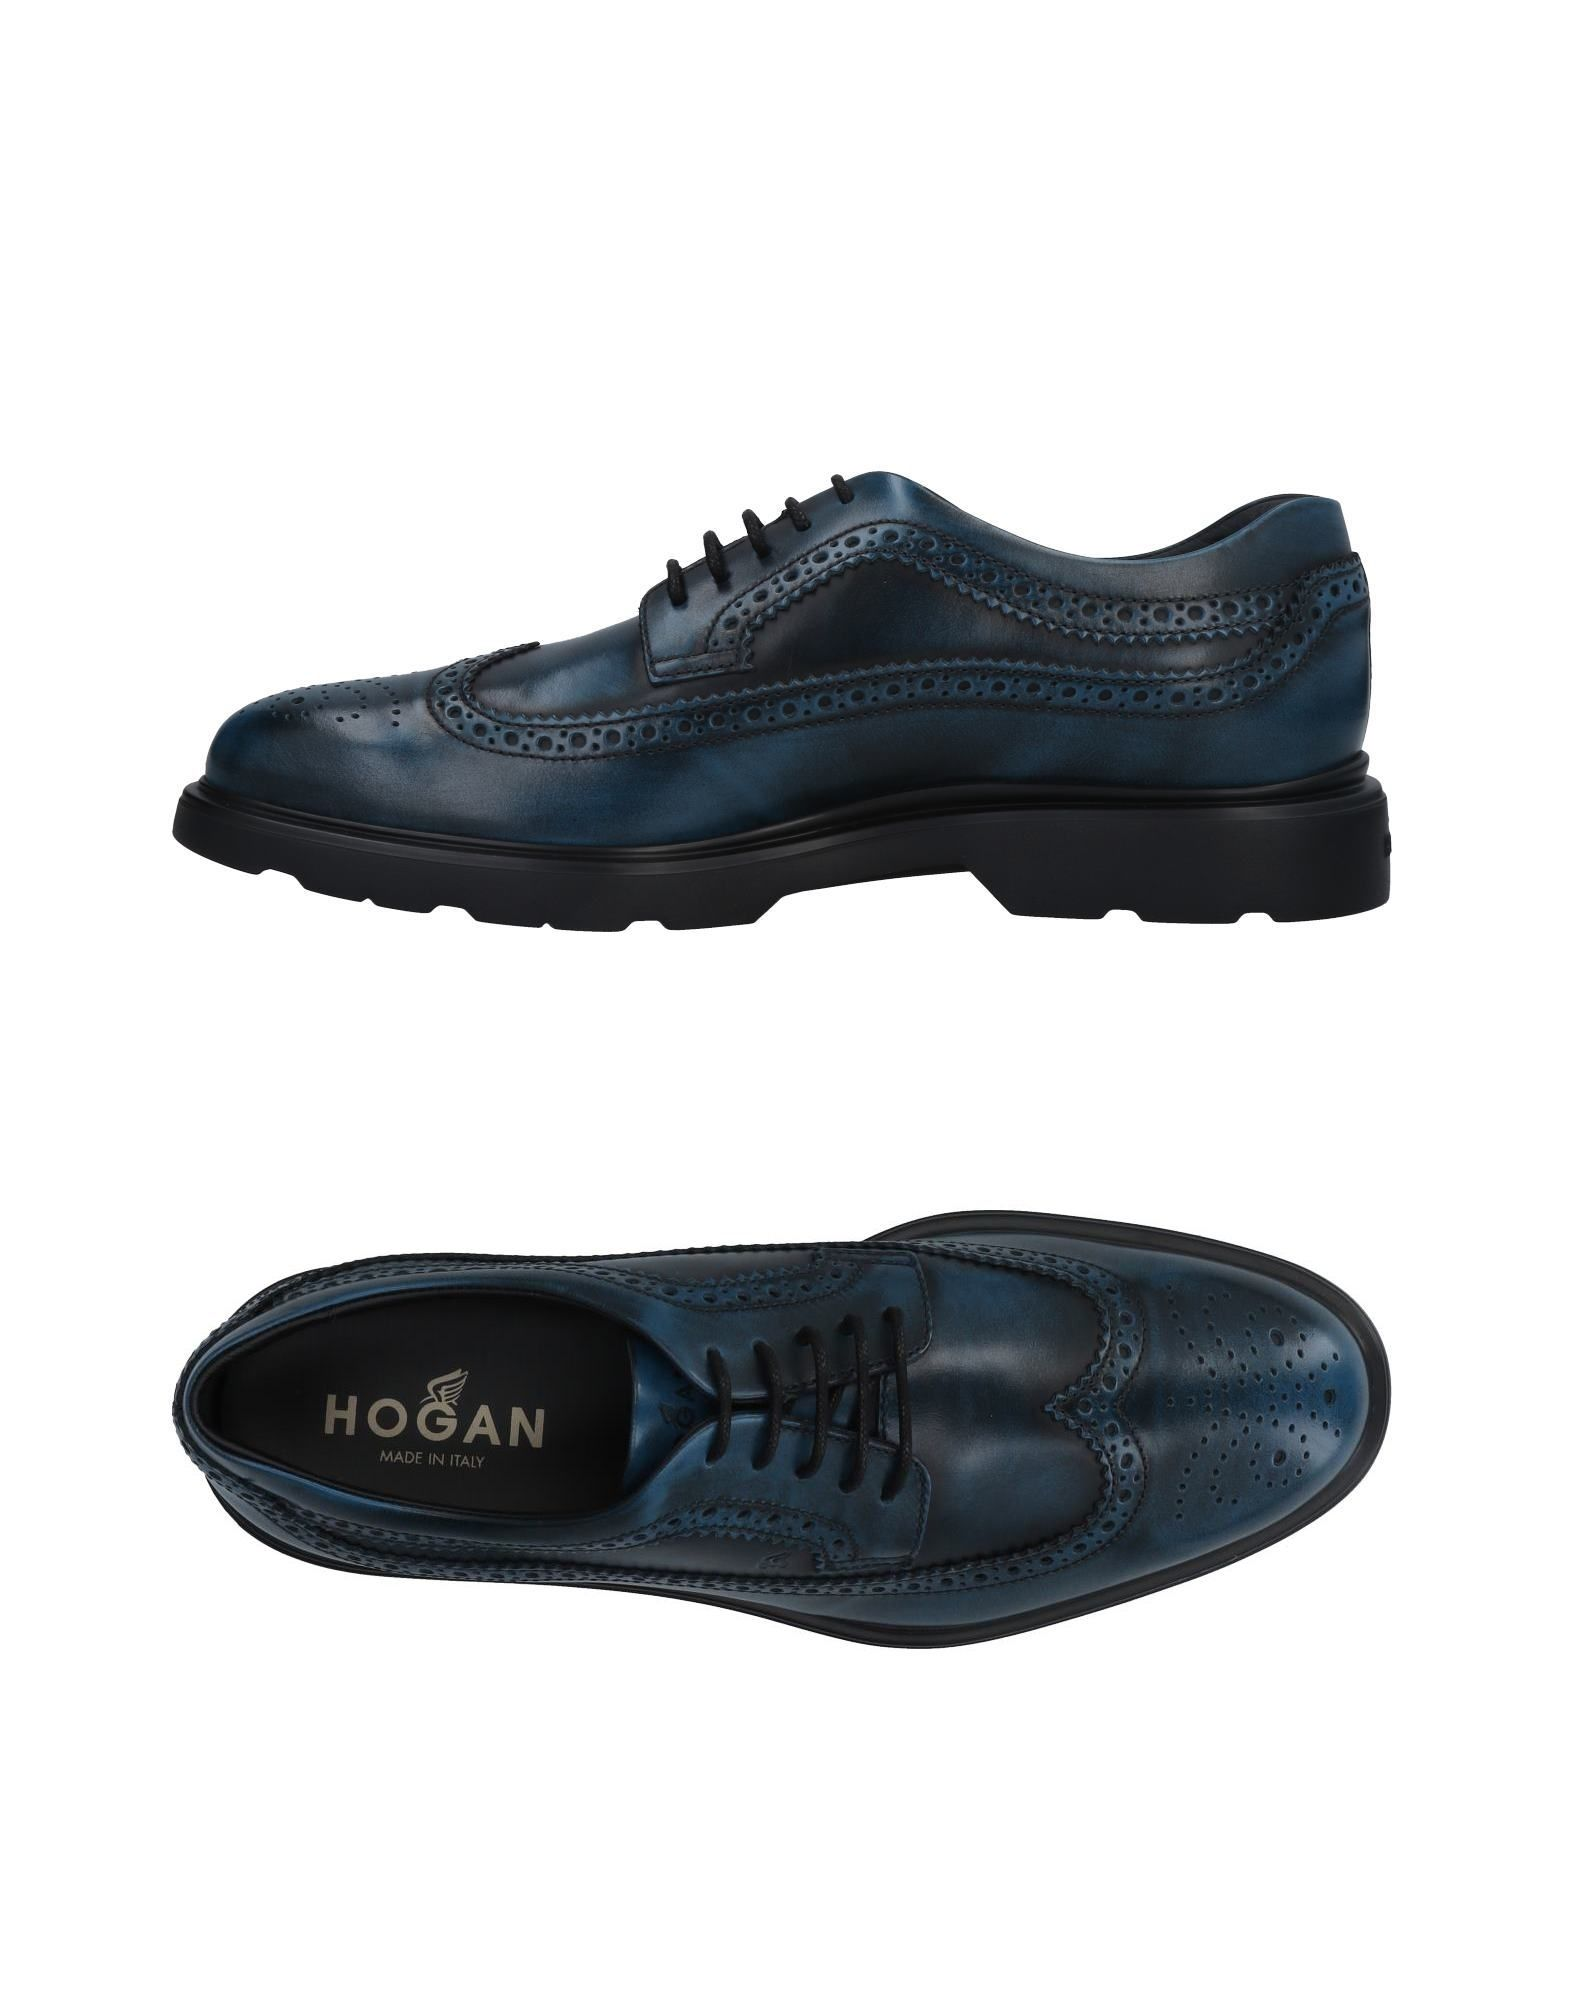 A buon mercato Stringate Hogan Uomo - 11486054QO